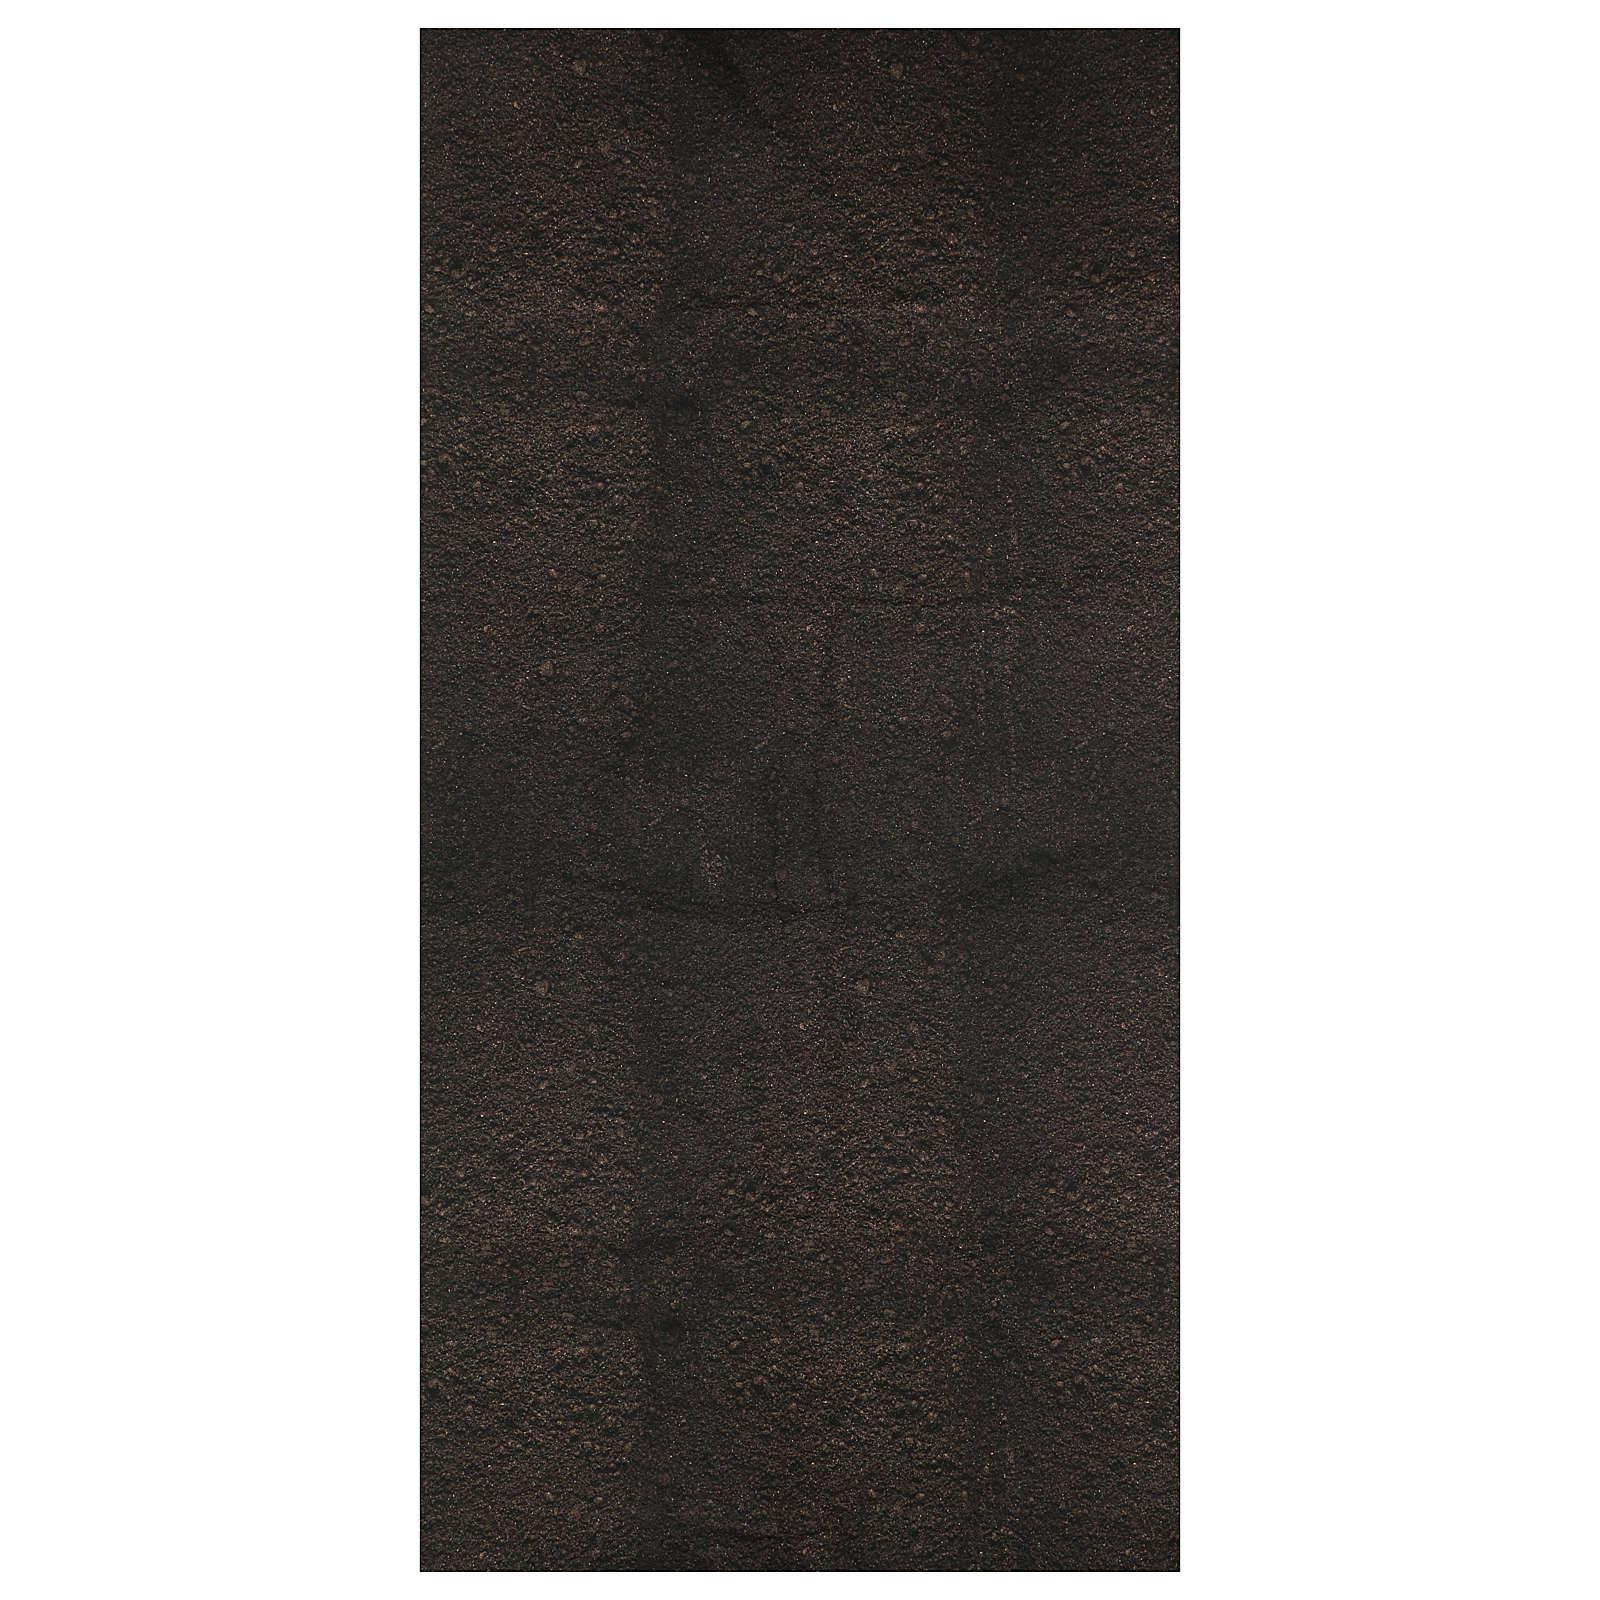 Carta terra scura plasmabile 120x60 cm per presepi 4